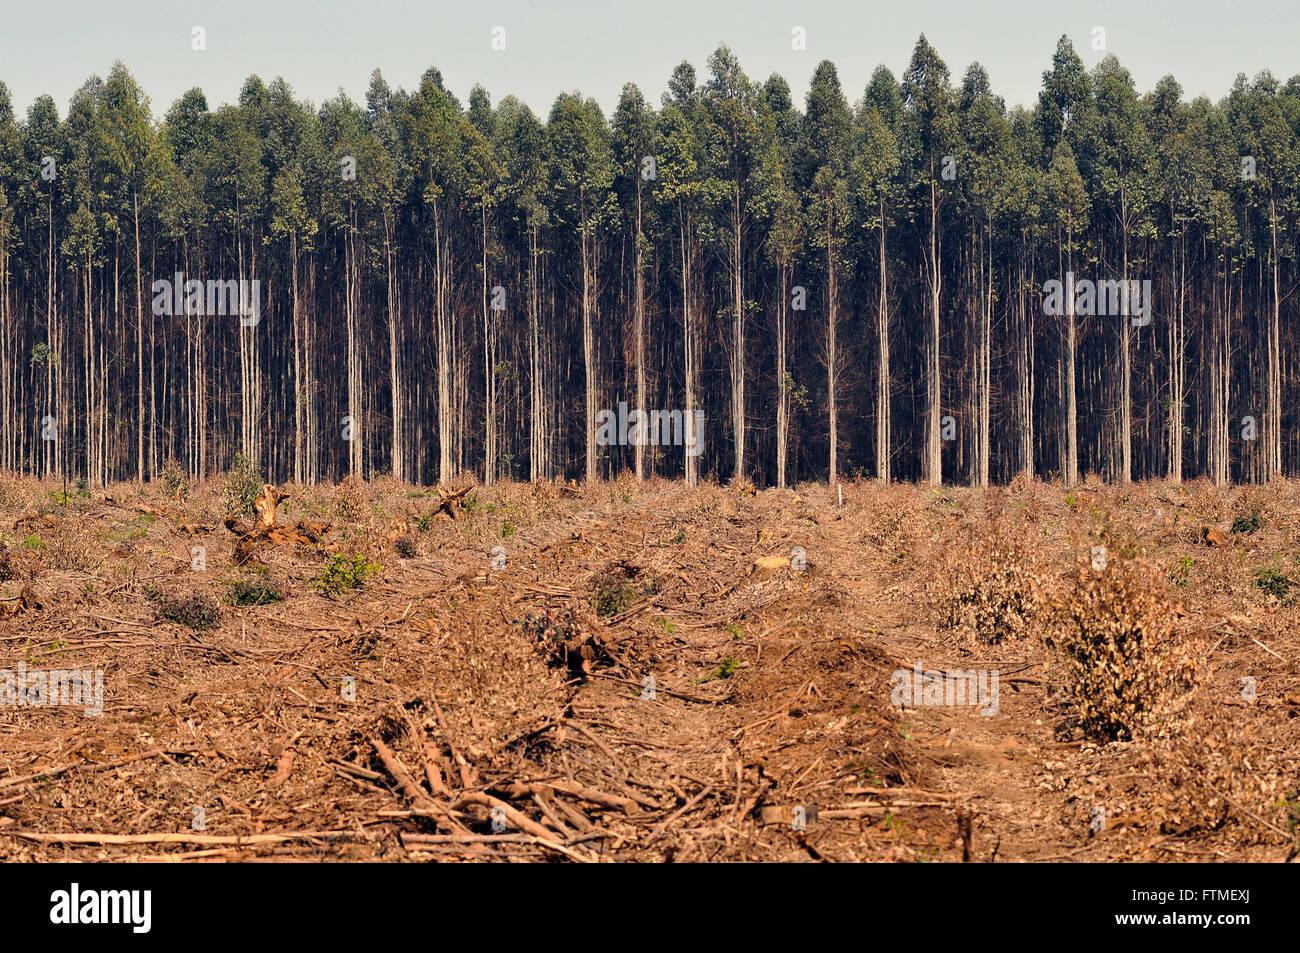 Plantation of Eucalyptus - Stock Image